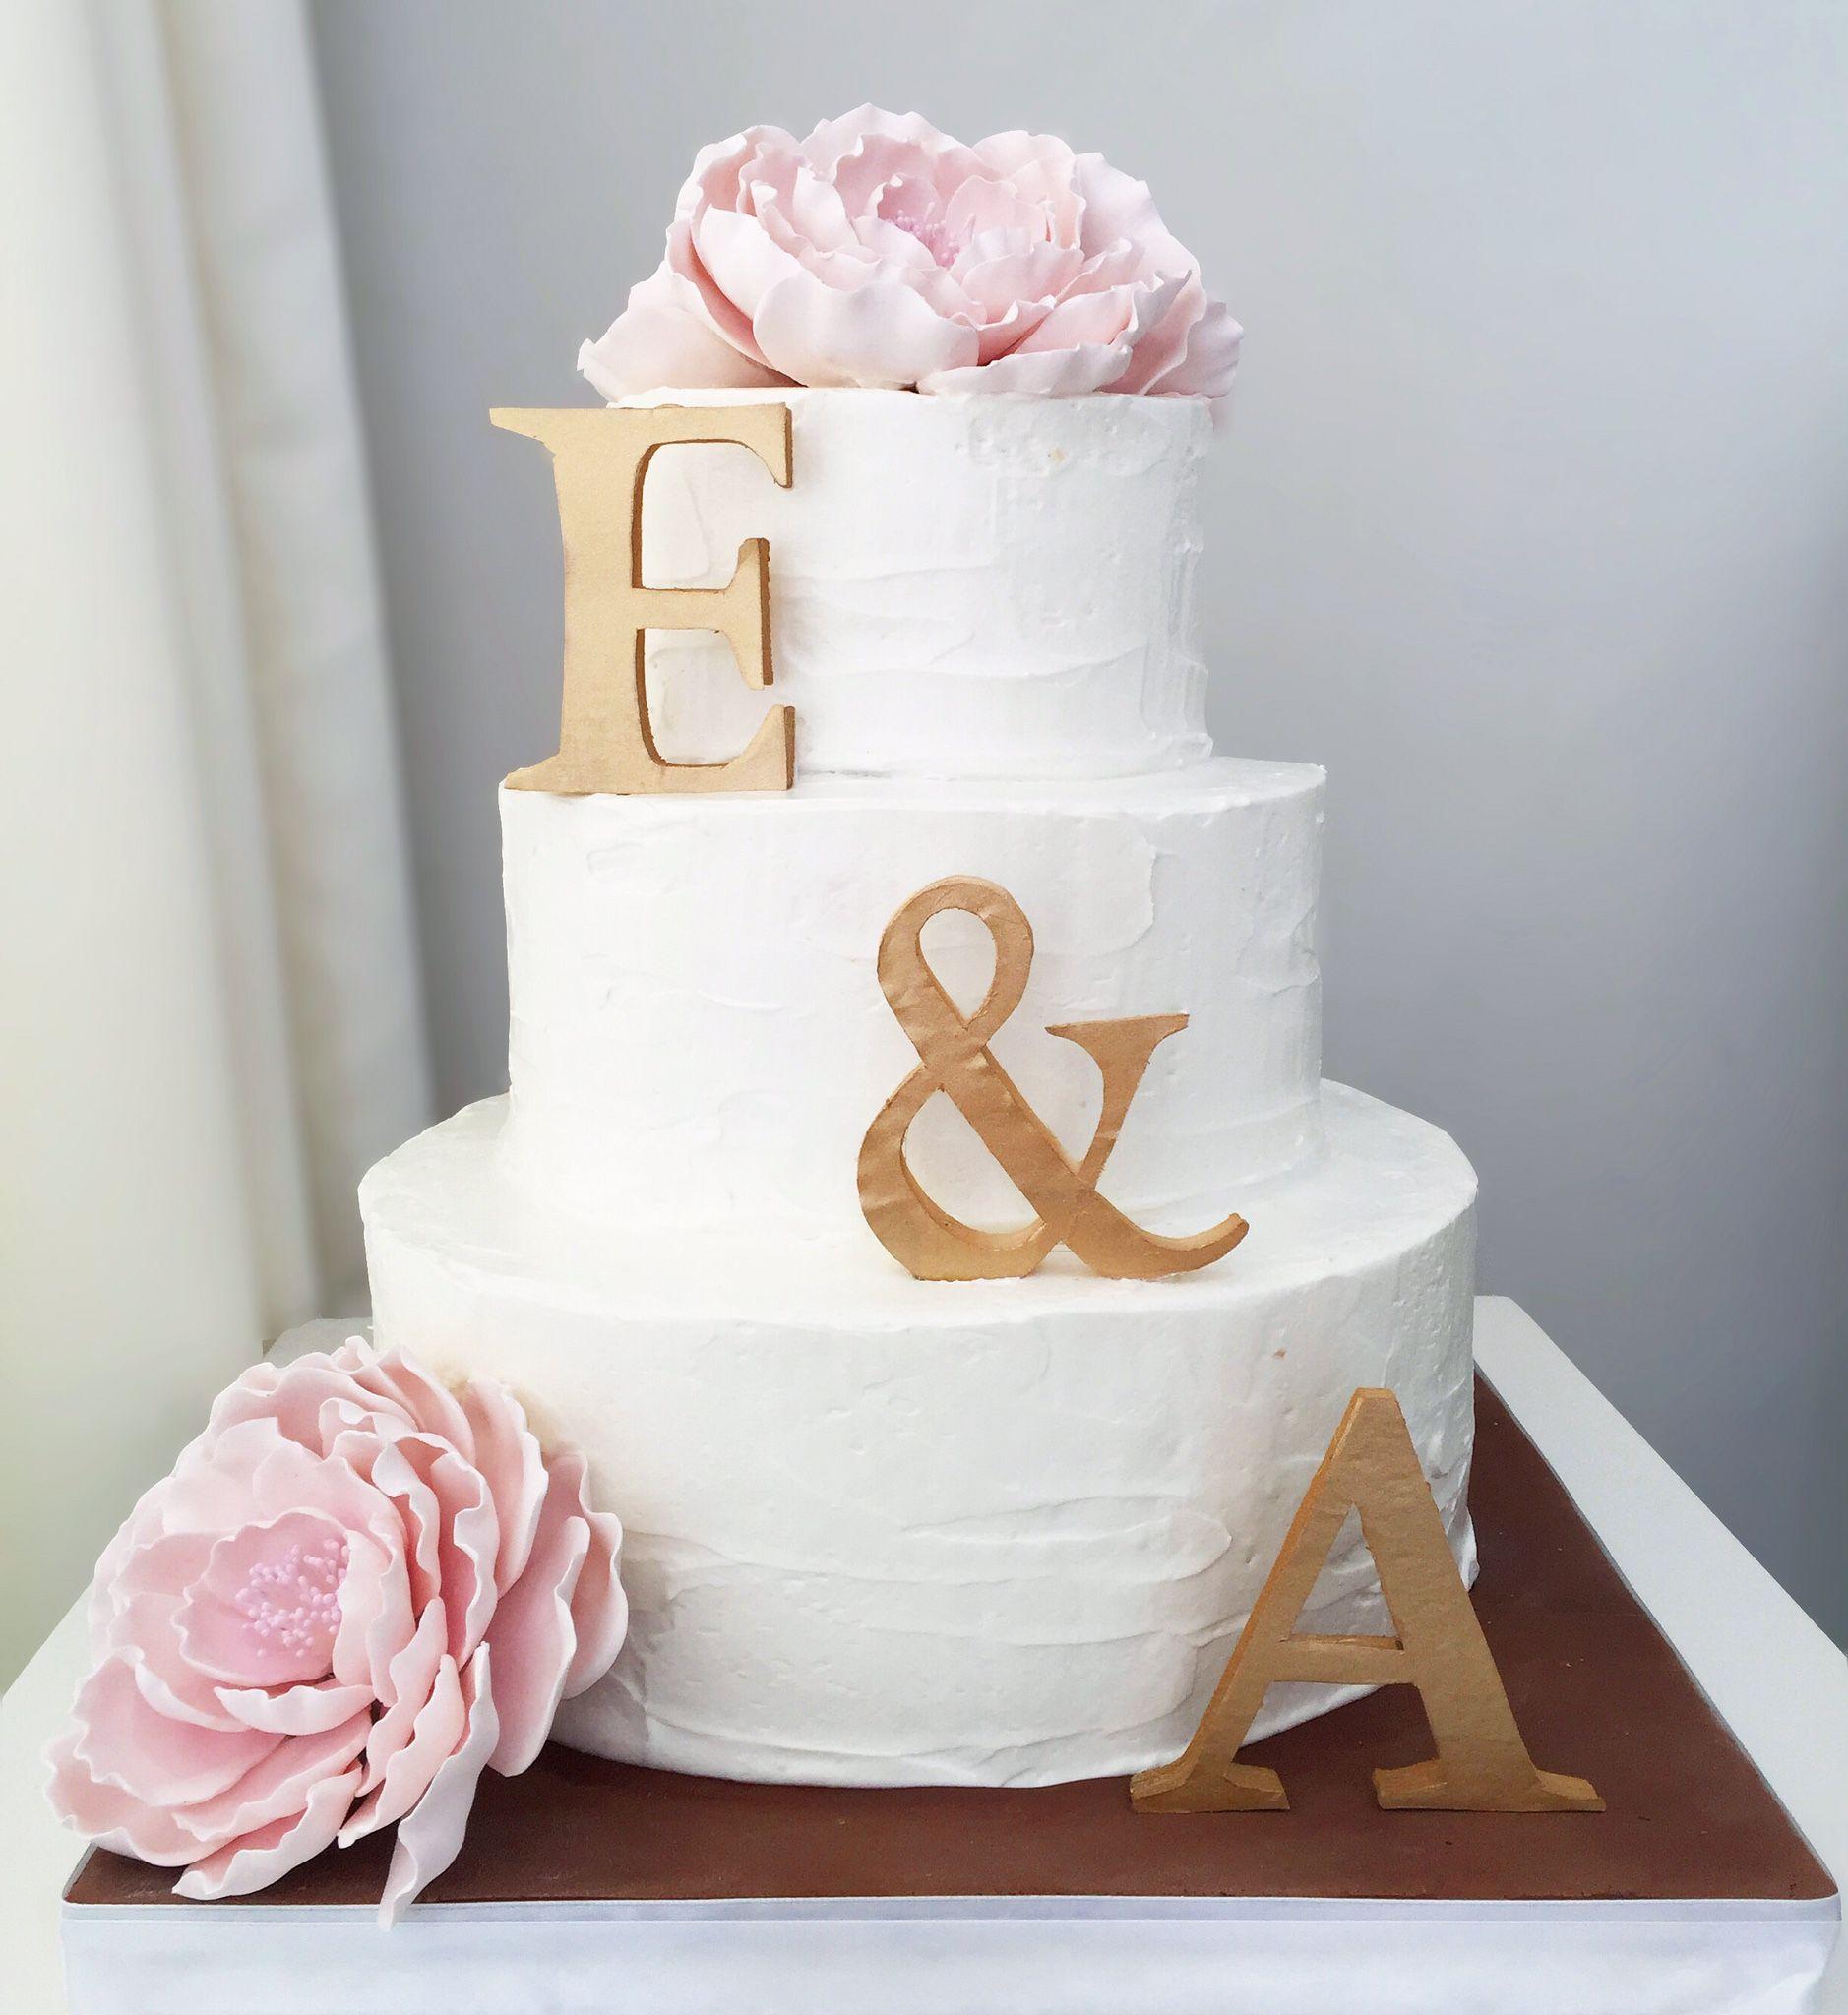 3 Tiers - Le Novelle Cake | Jakarta & Bali Wedding Cake | WEDDING ...